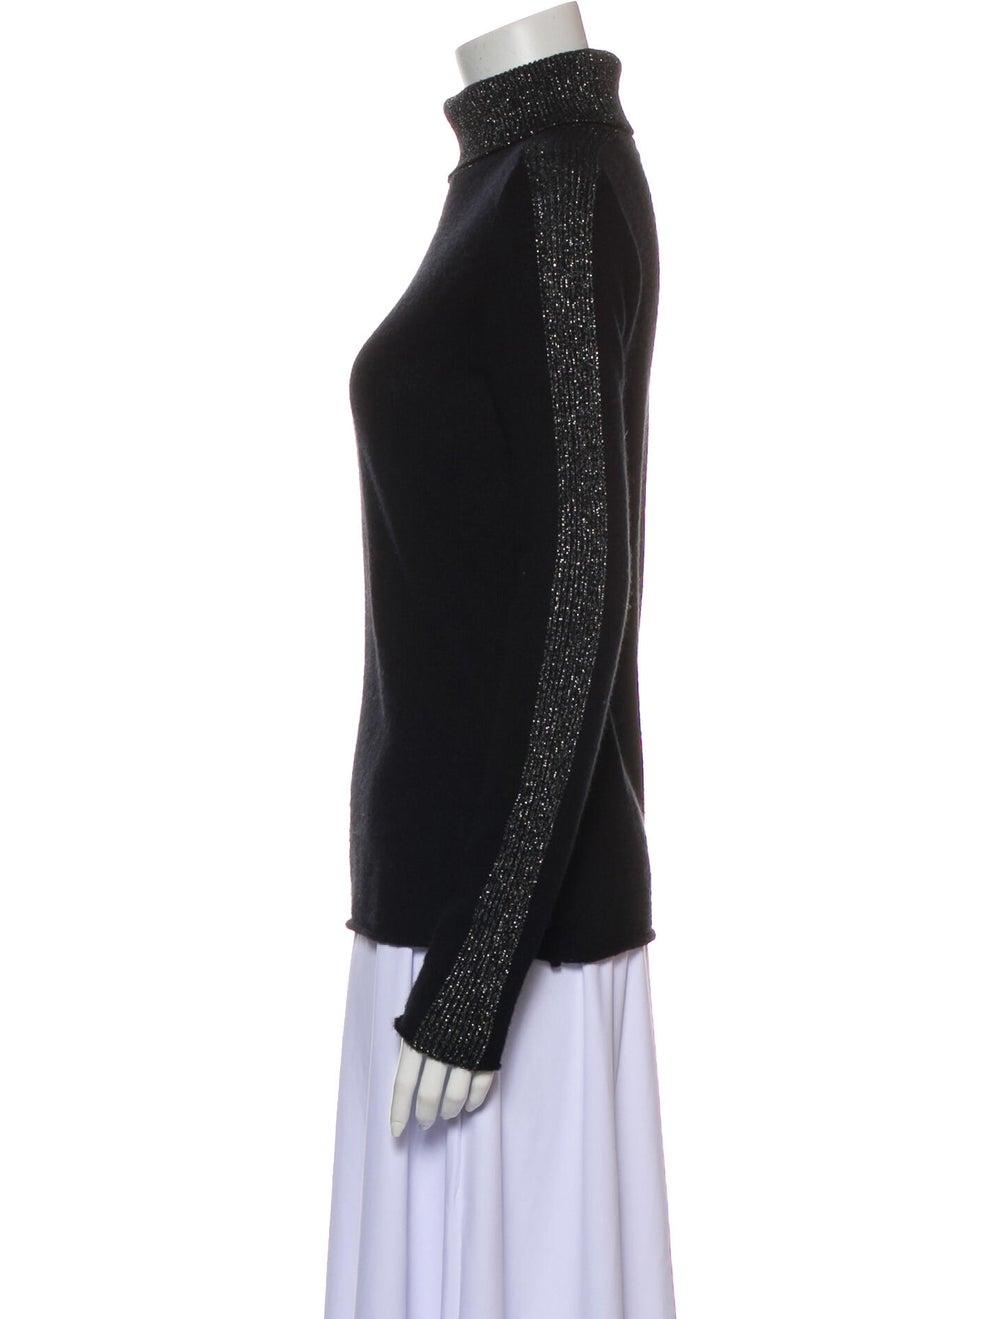 ATM Cashmere Turtleneck Sweater Black - image 2